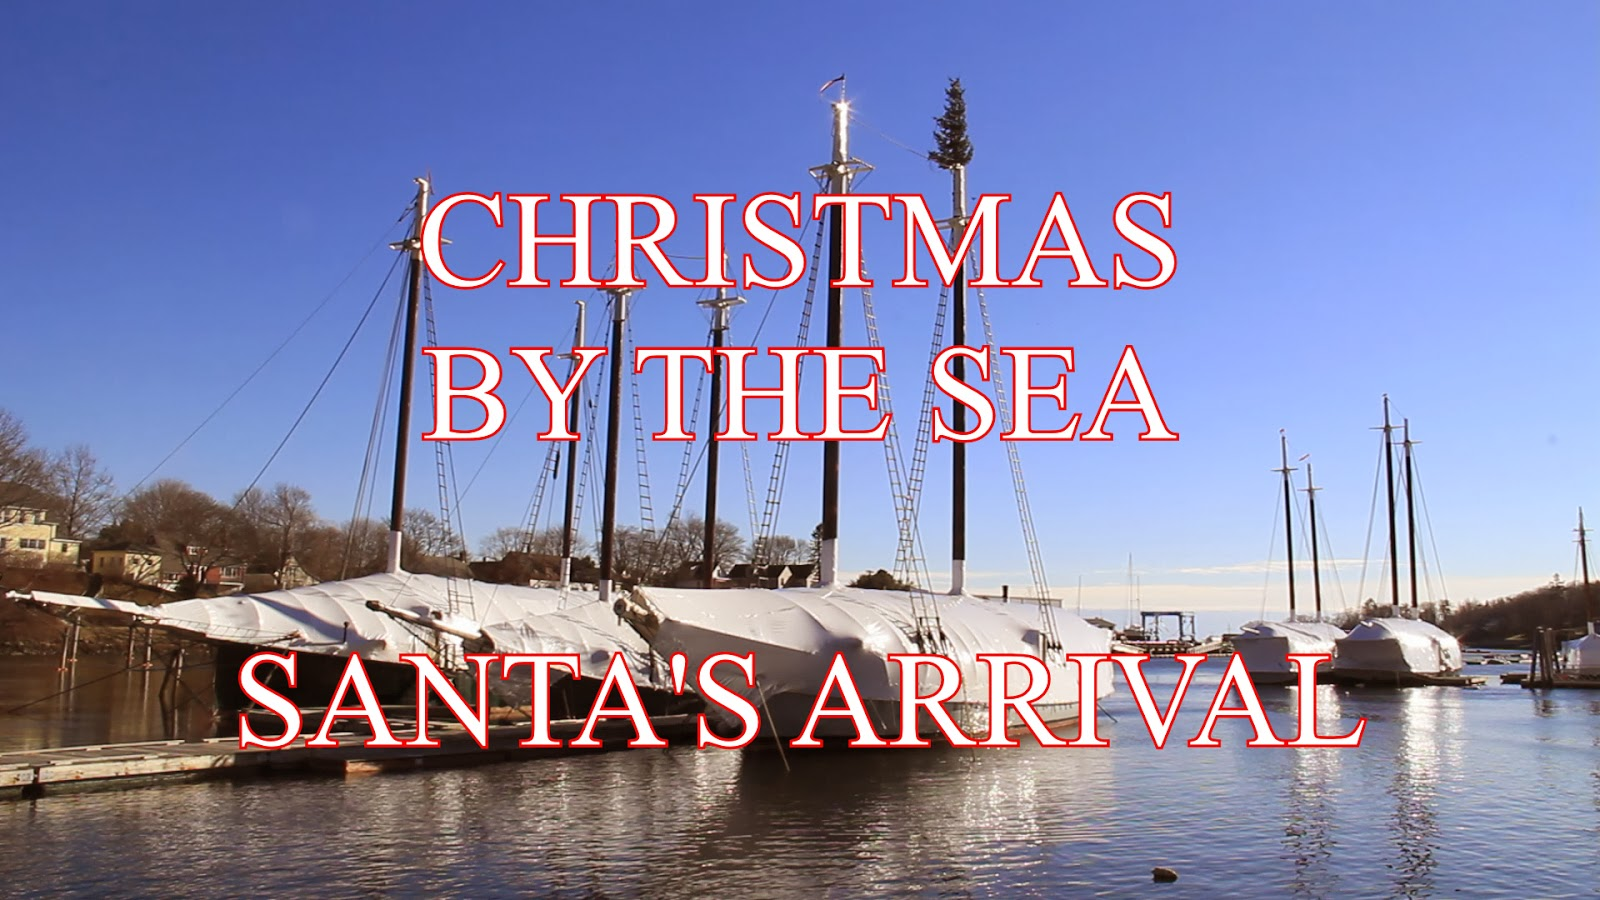 Christmas By The Sea Camden Maine.Rocky Coast News Video Santa Arrives For Christmas By The Sea